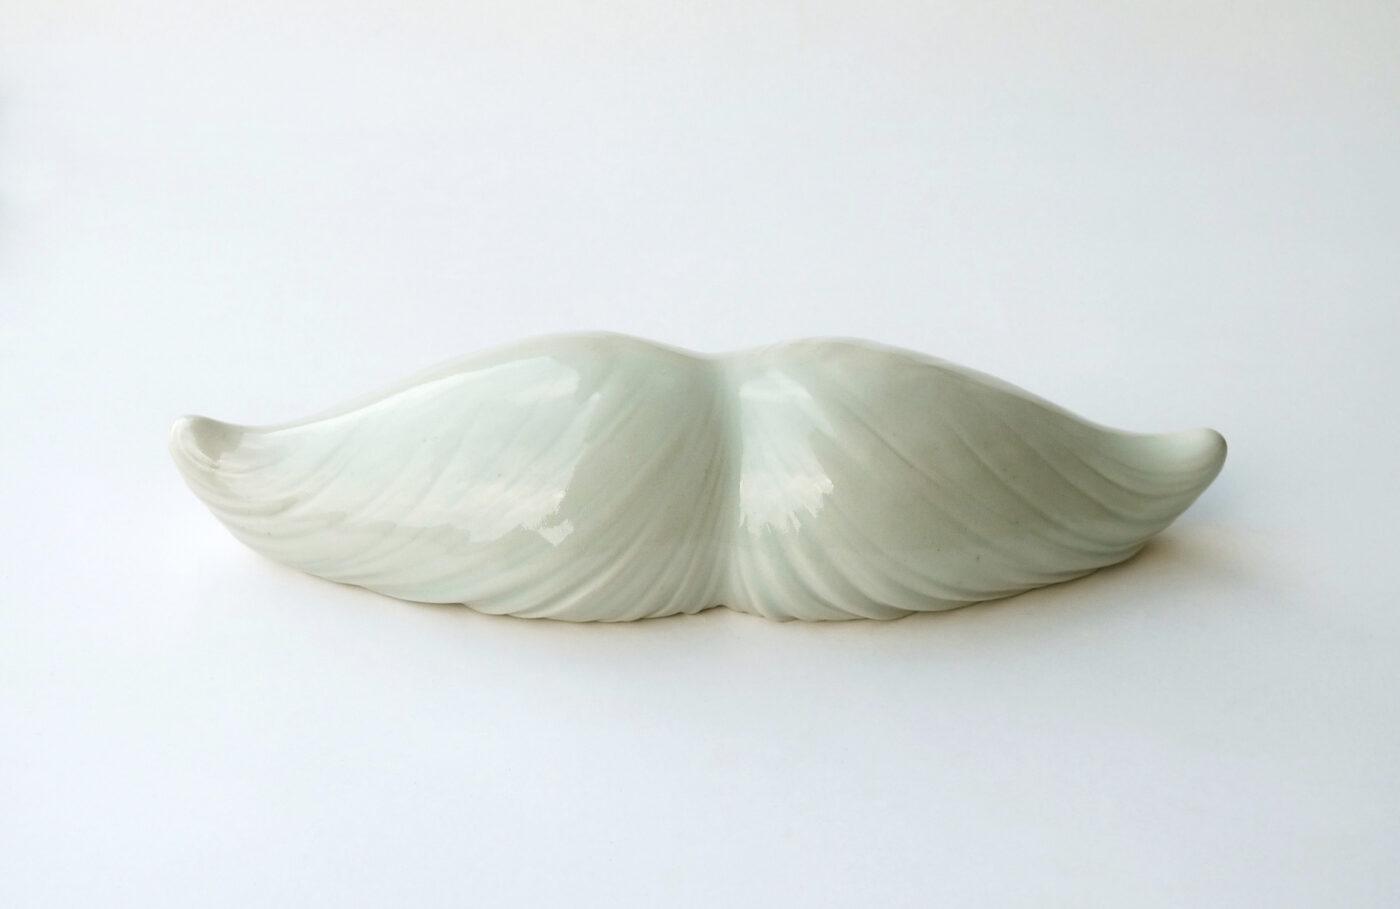 Keramiker Marianne Nielsen - Moustache, 2009